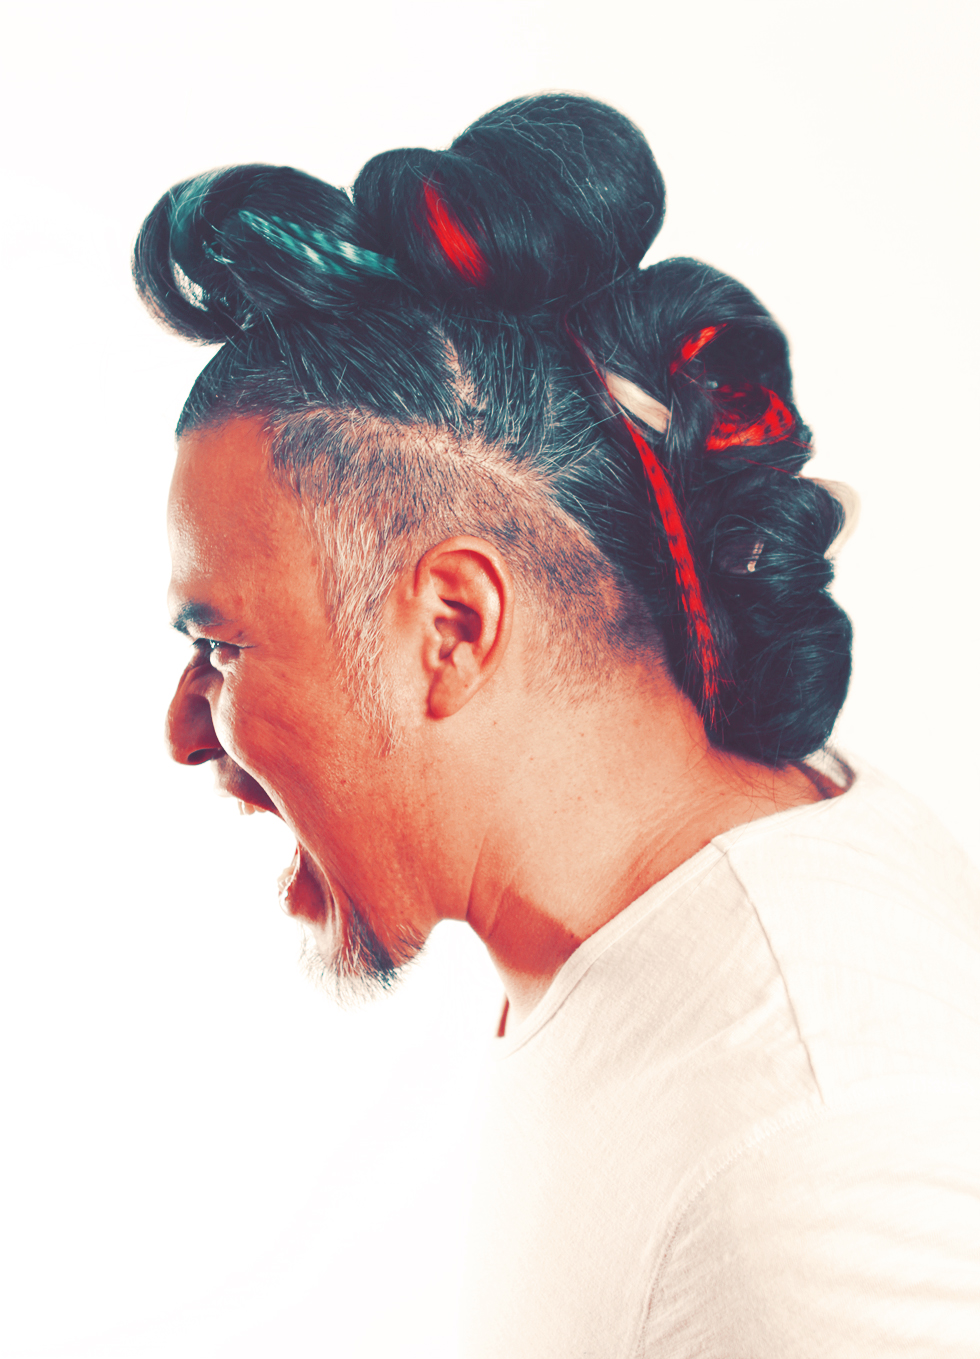 danielle-richardson-hair-example-short-mens-cut.jpg